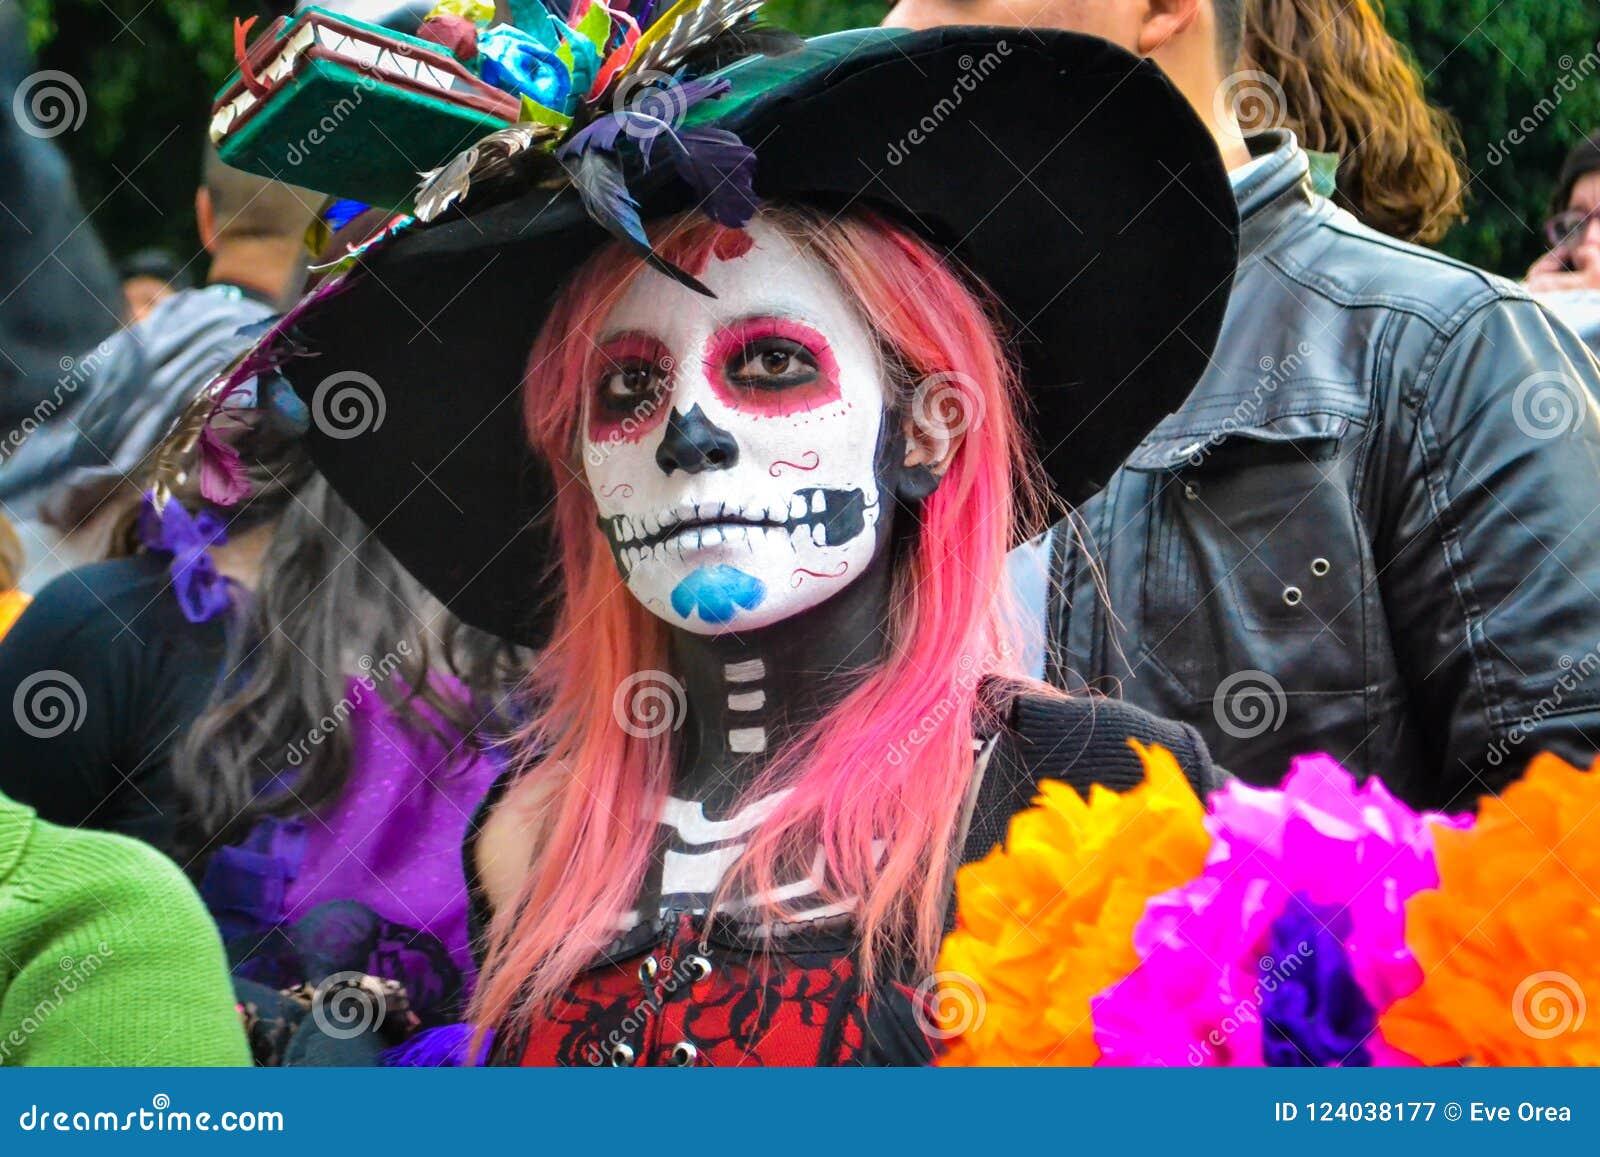 Mexico City, Mexico, ; November 1 2015: Sugar skull girl at the Day of the Dead celebration in Mexico City